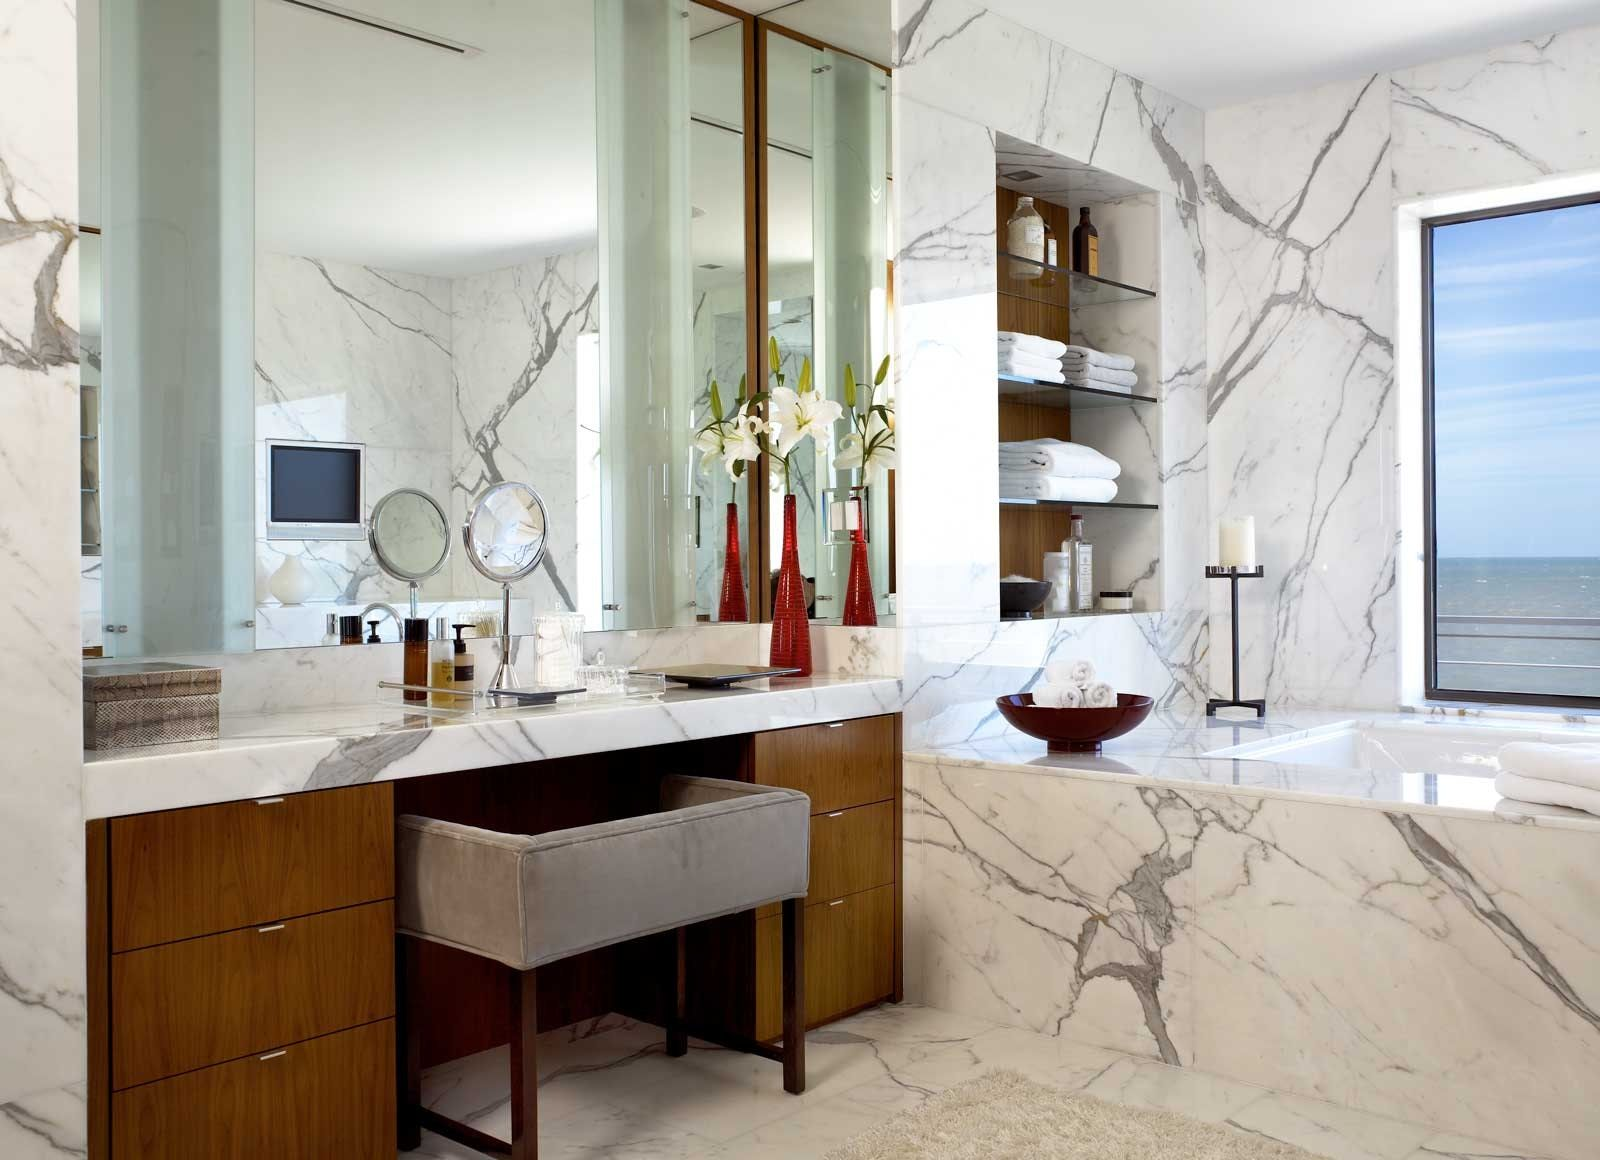 Johns Island Residence Vero Beach Fl Master Bathroom Contemporary Bathroom Designs Interior Design Portfolios Contemporary Bathrooms